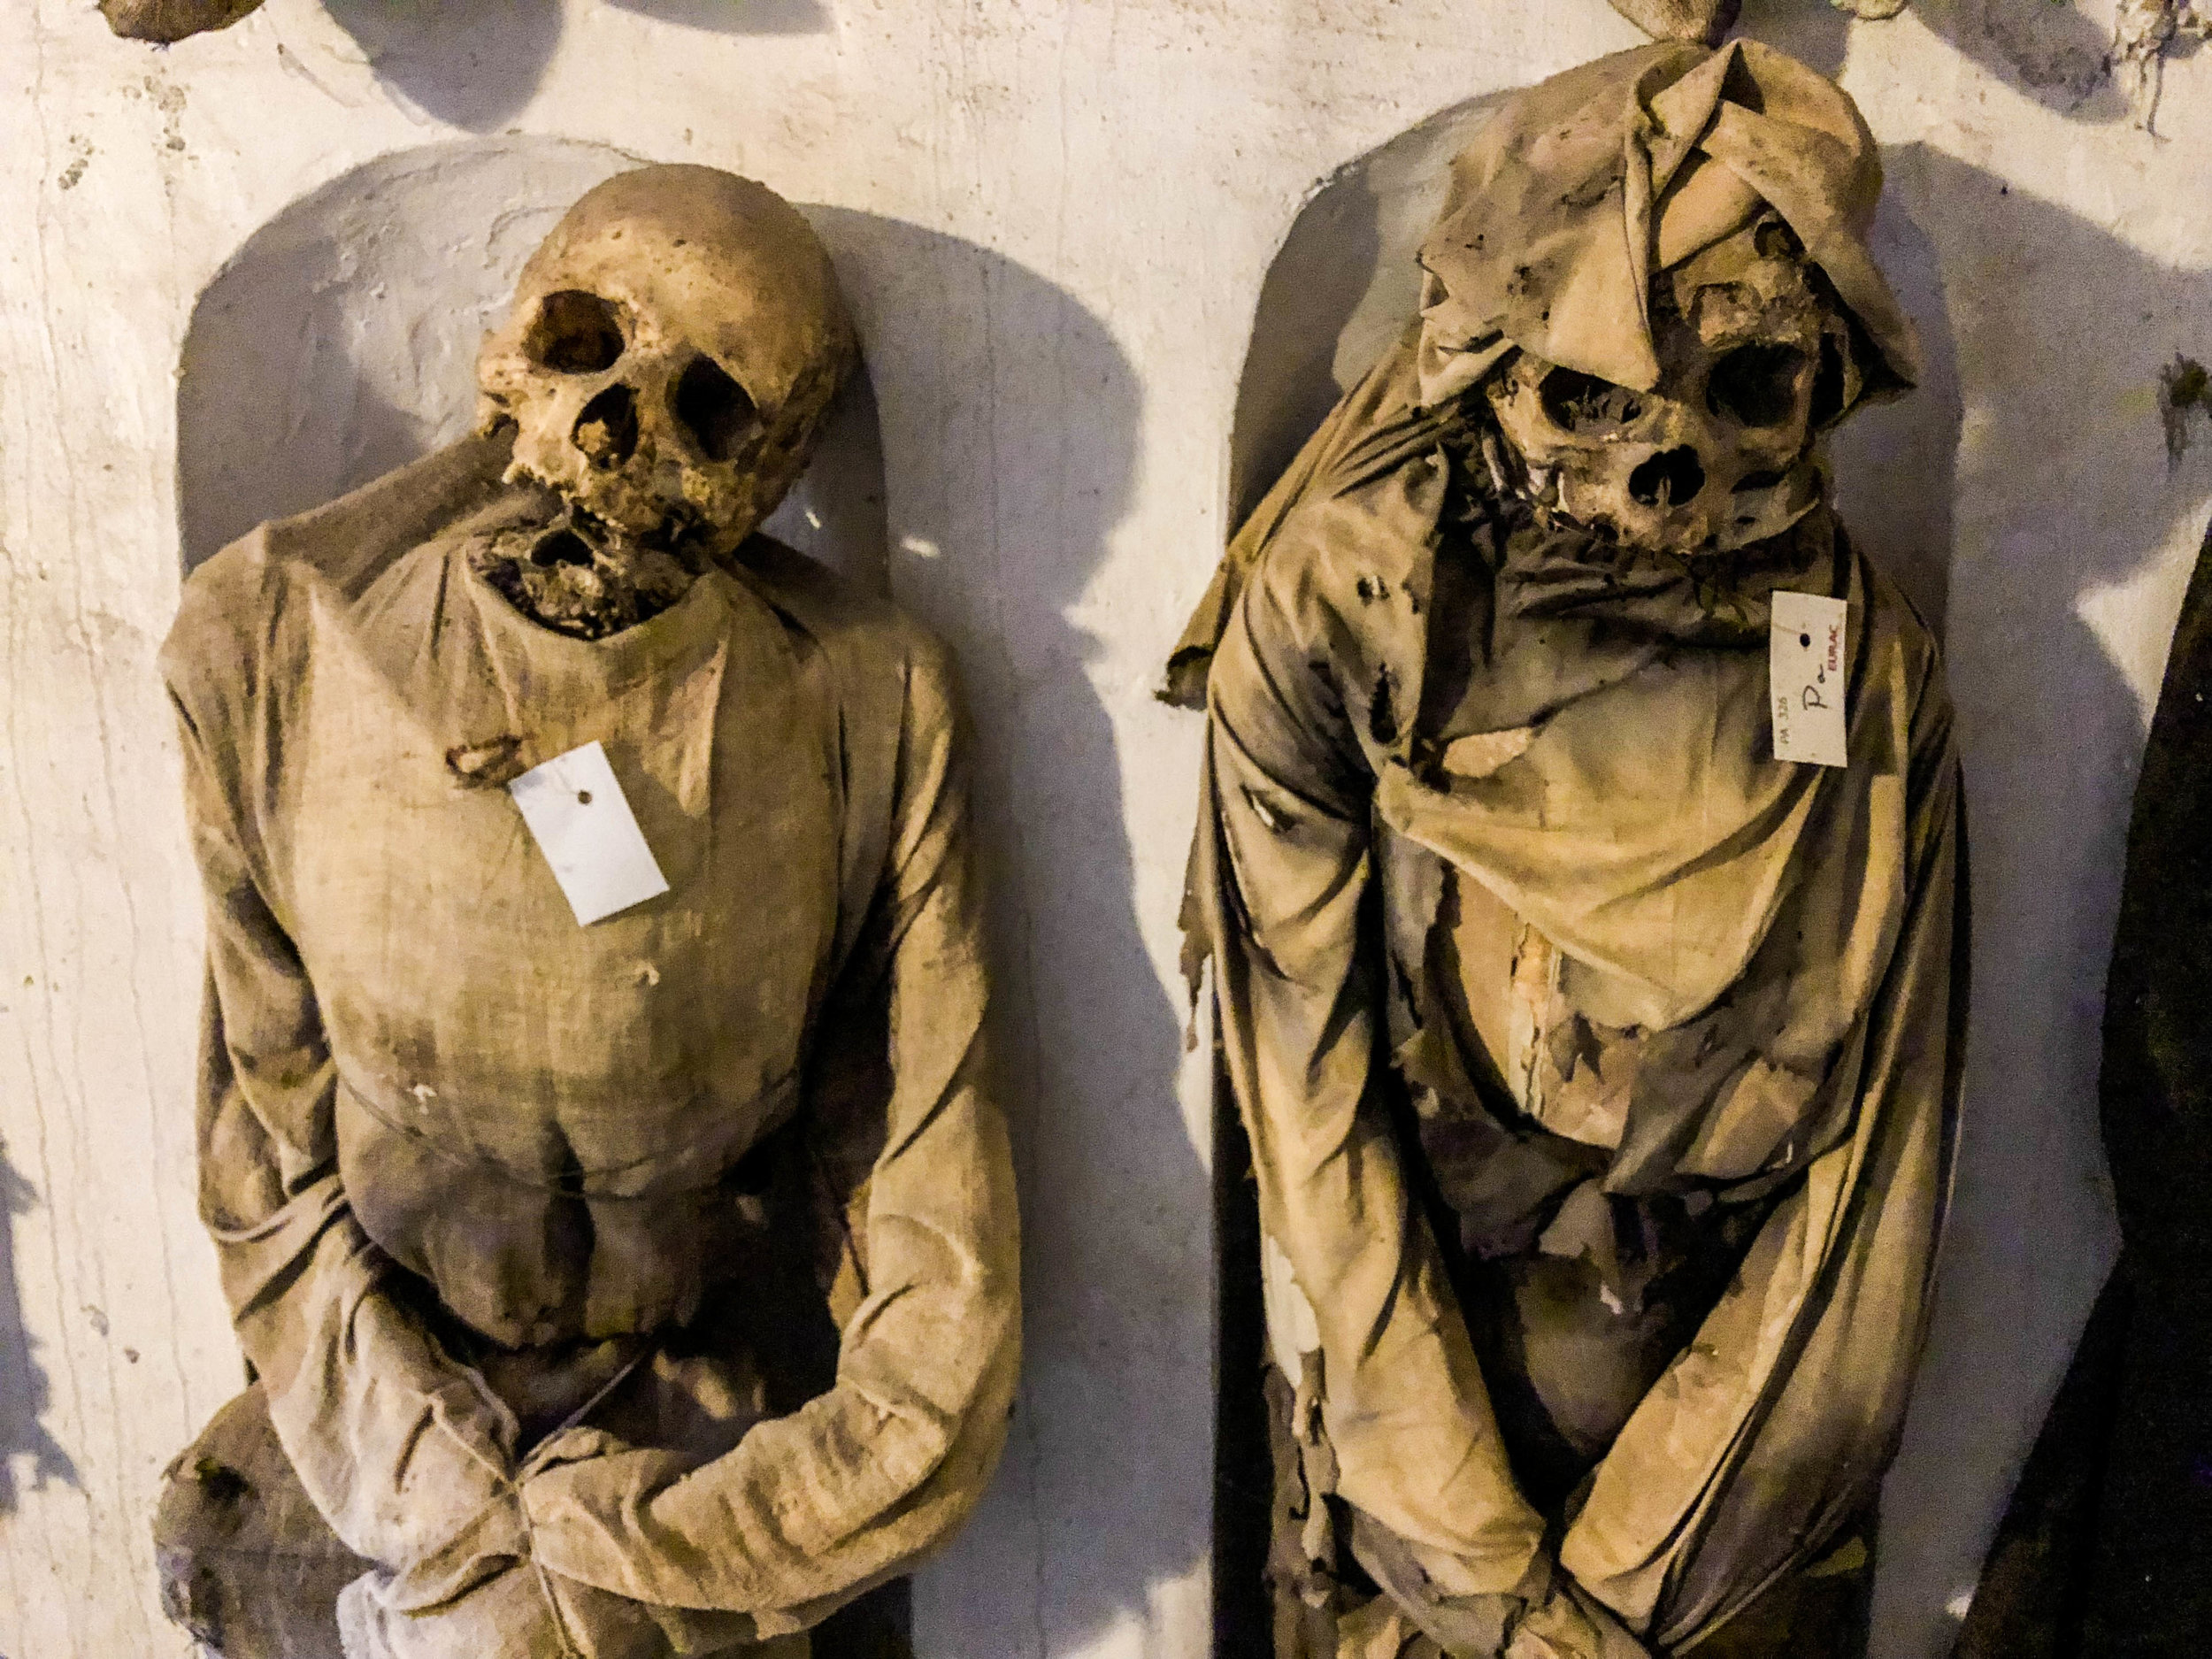 capuchin-catacombs-bodies-palermo-12.jpg